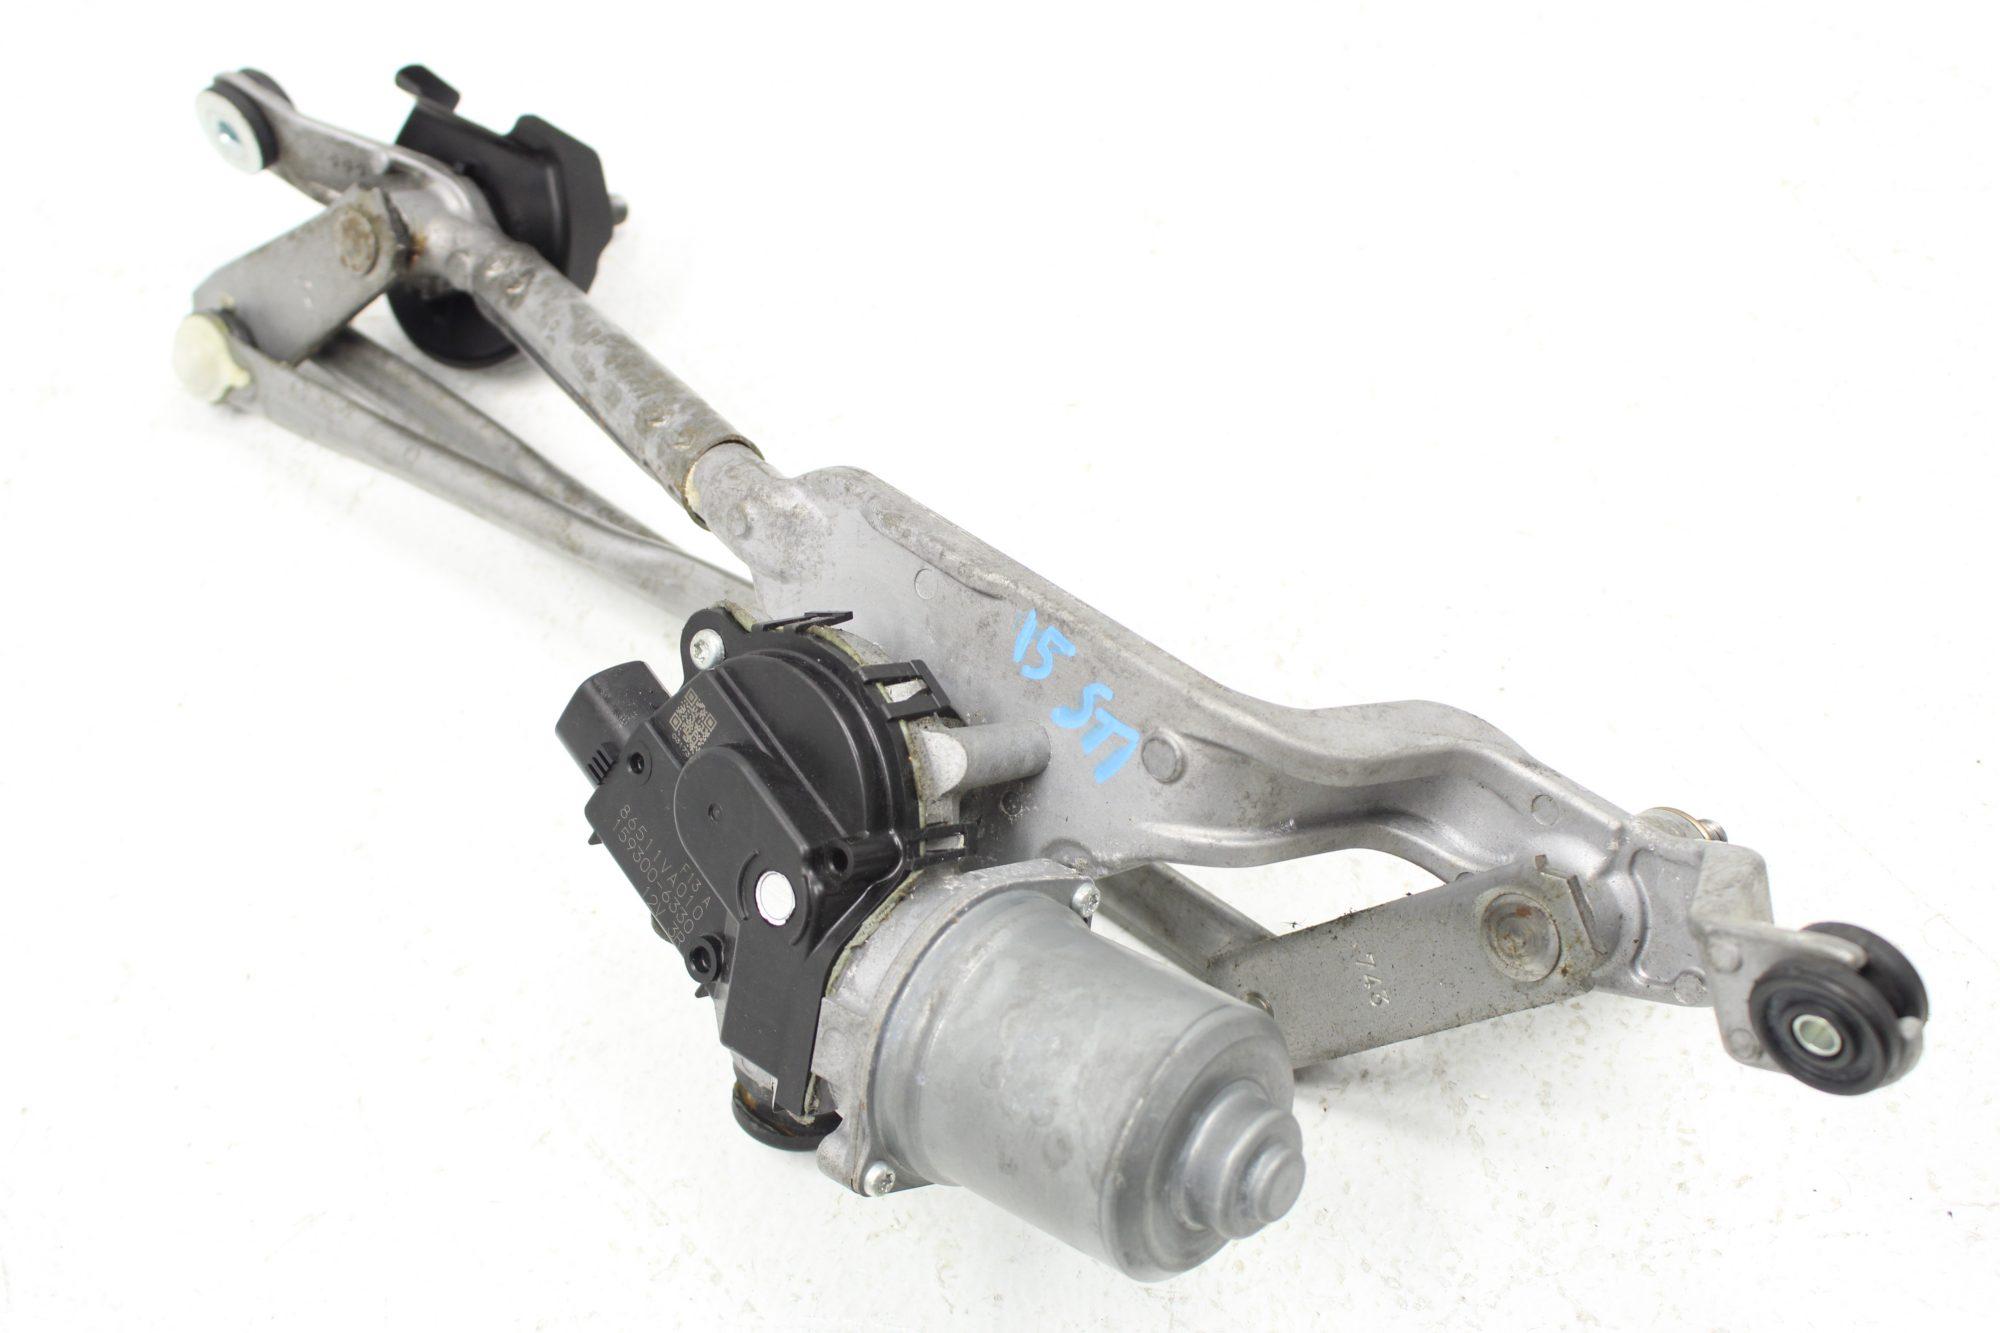 2015-2020 subaru wrx & sti windshield wiper motor assembly